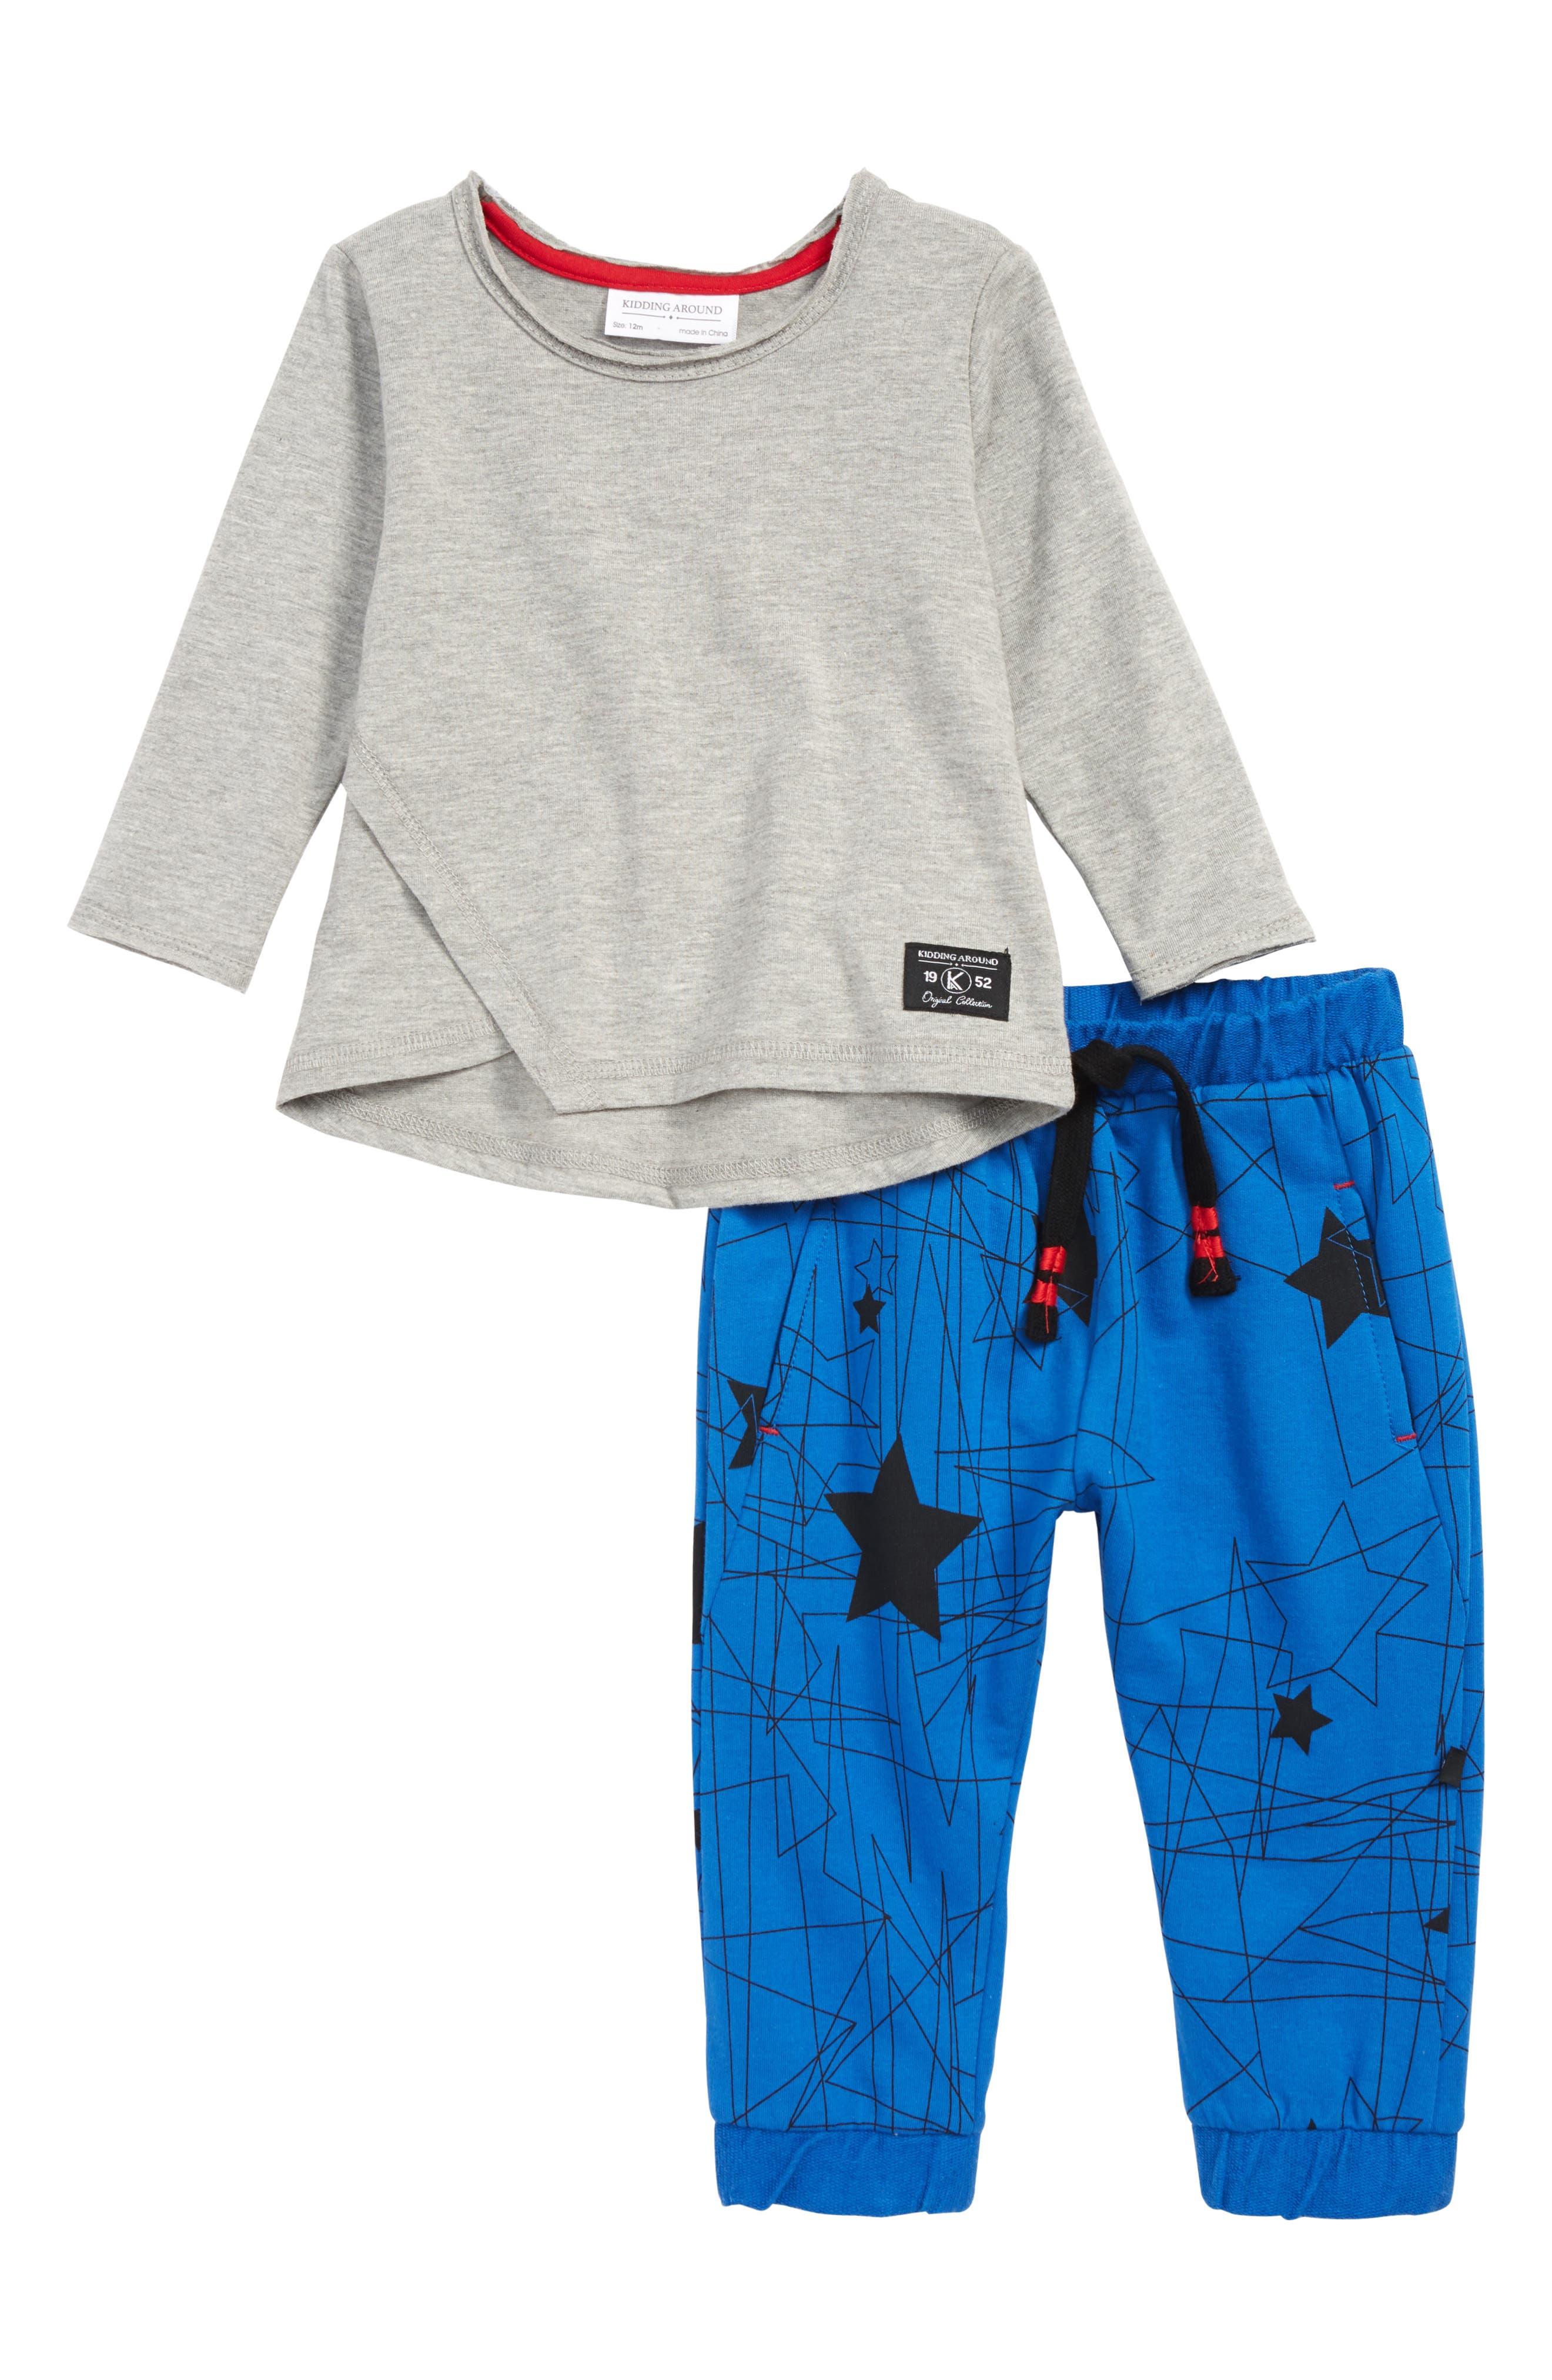 KIDDING AROUND Long Sleeve Shirt & Sweatpants Set, Main, color, HEATHER GREY/ COBALT